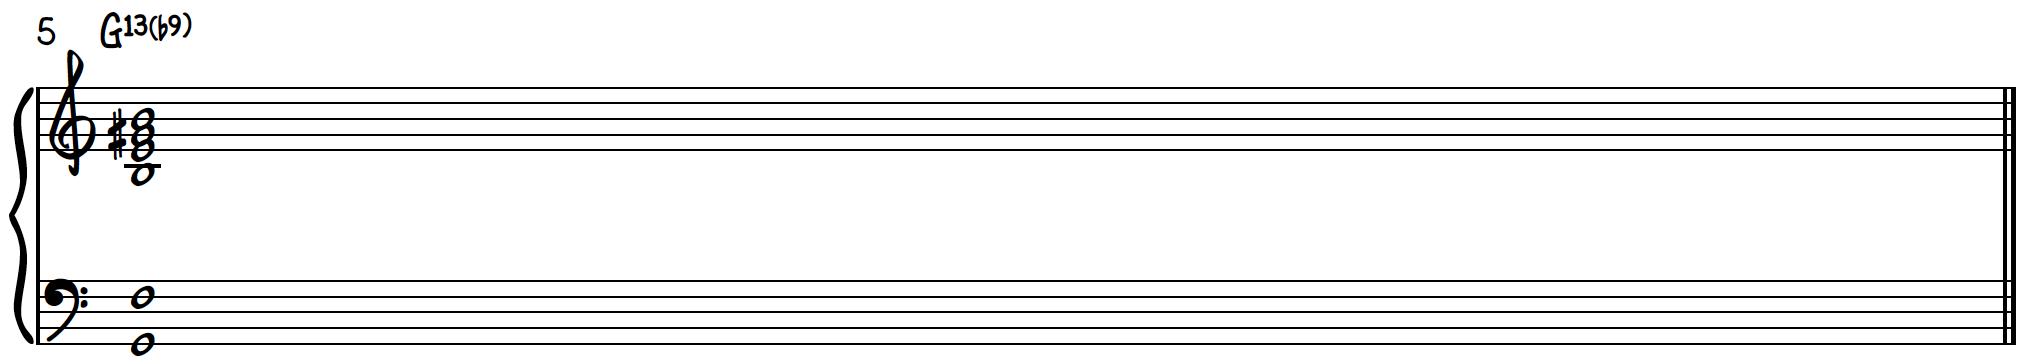 Dissonant Chord 2 transformed to jazz chord G13(b9) on piano